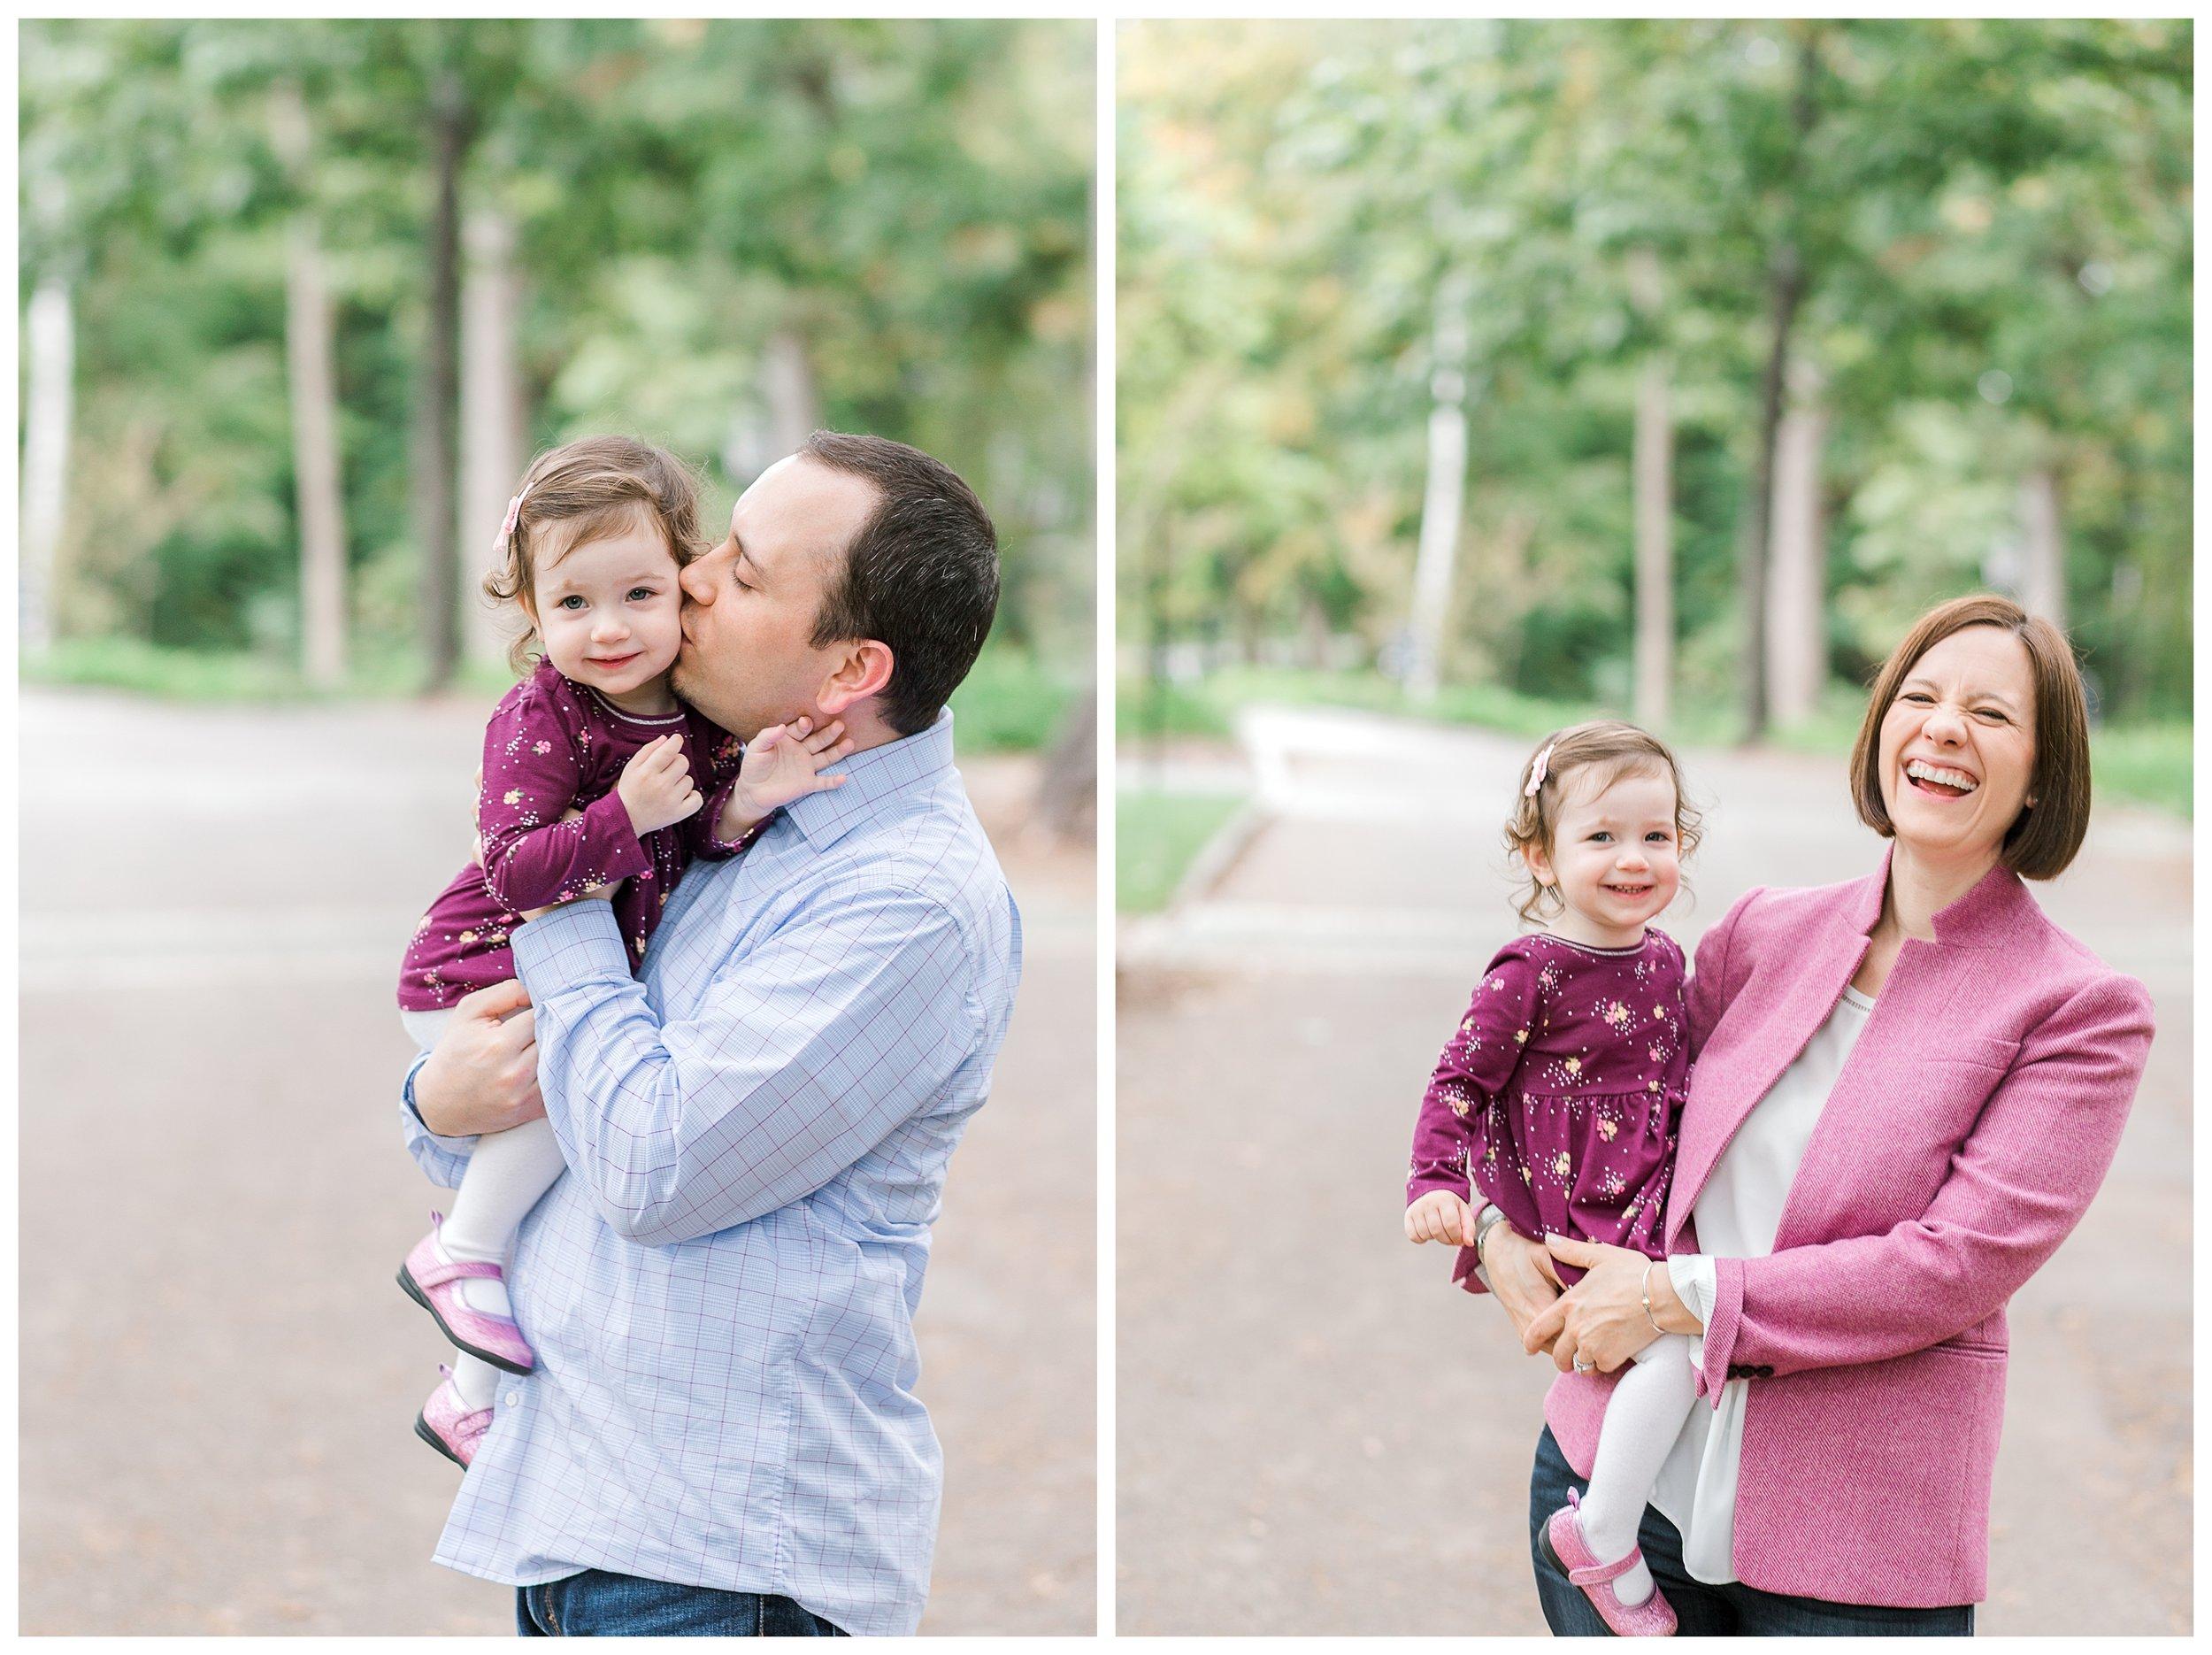 wellesley_family_photographer_erica_pezente_photo  (3).jpg